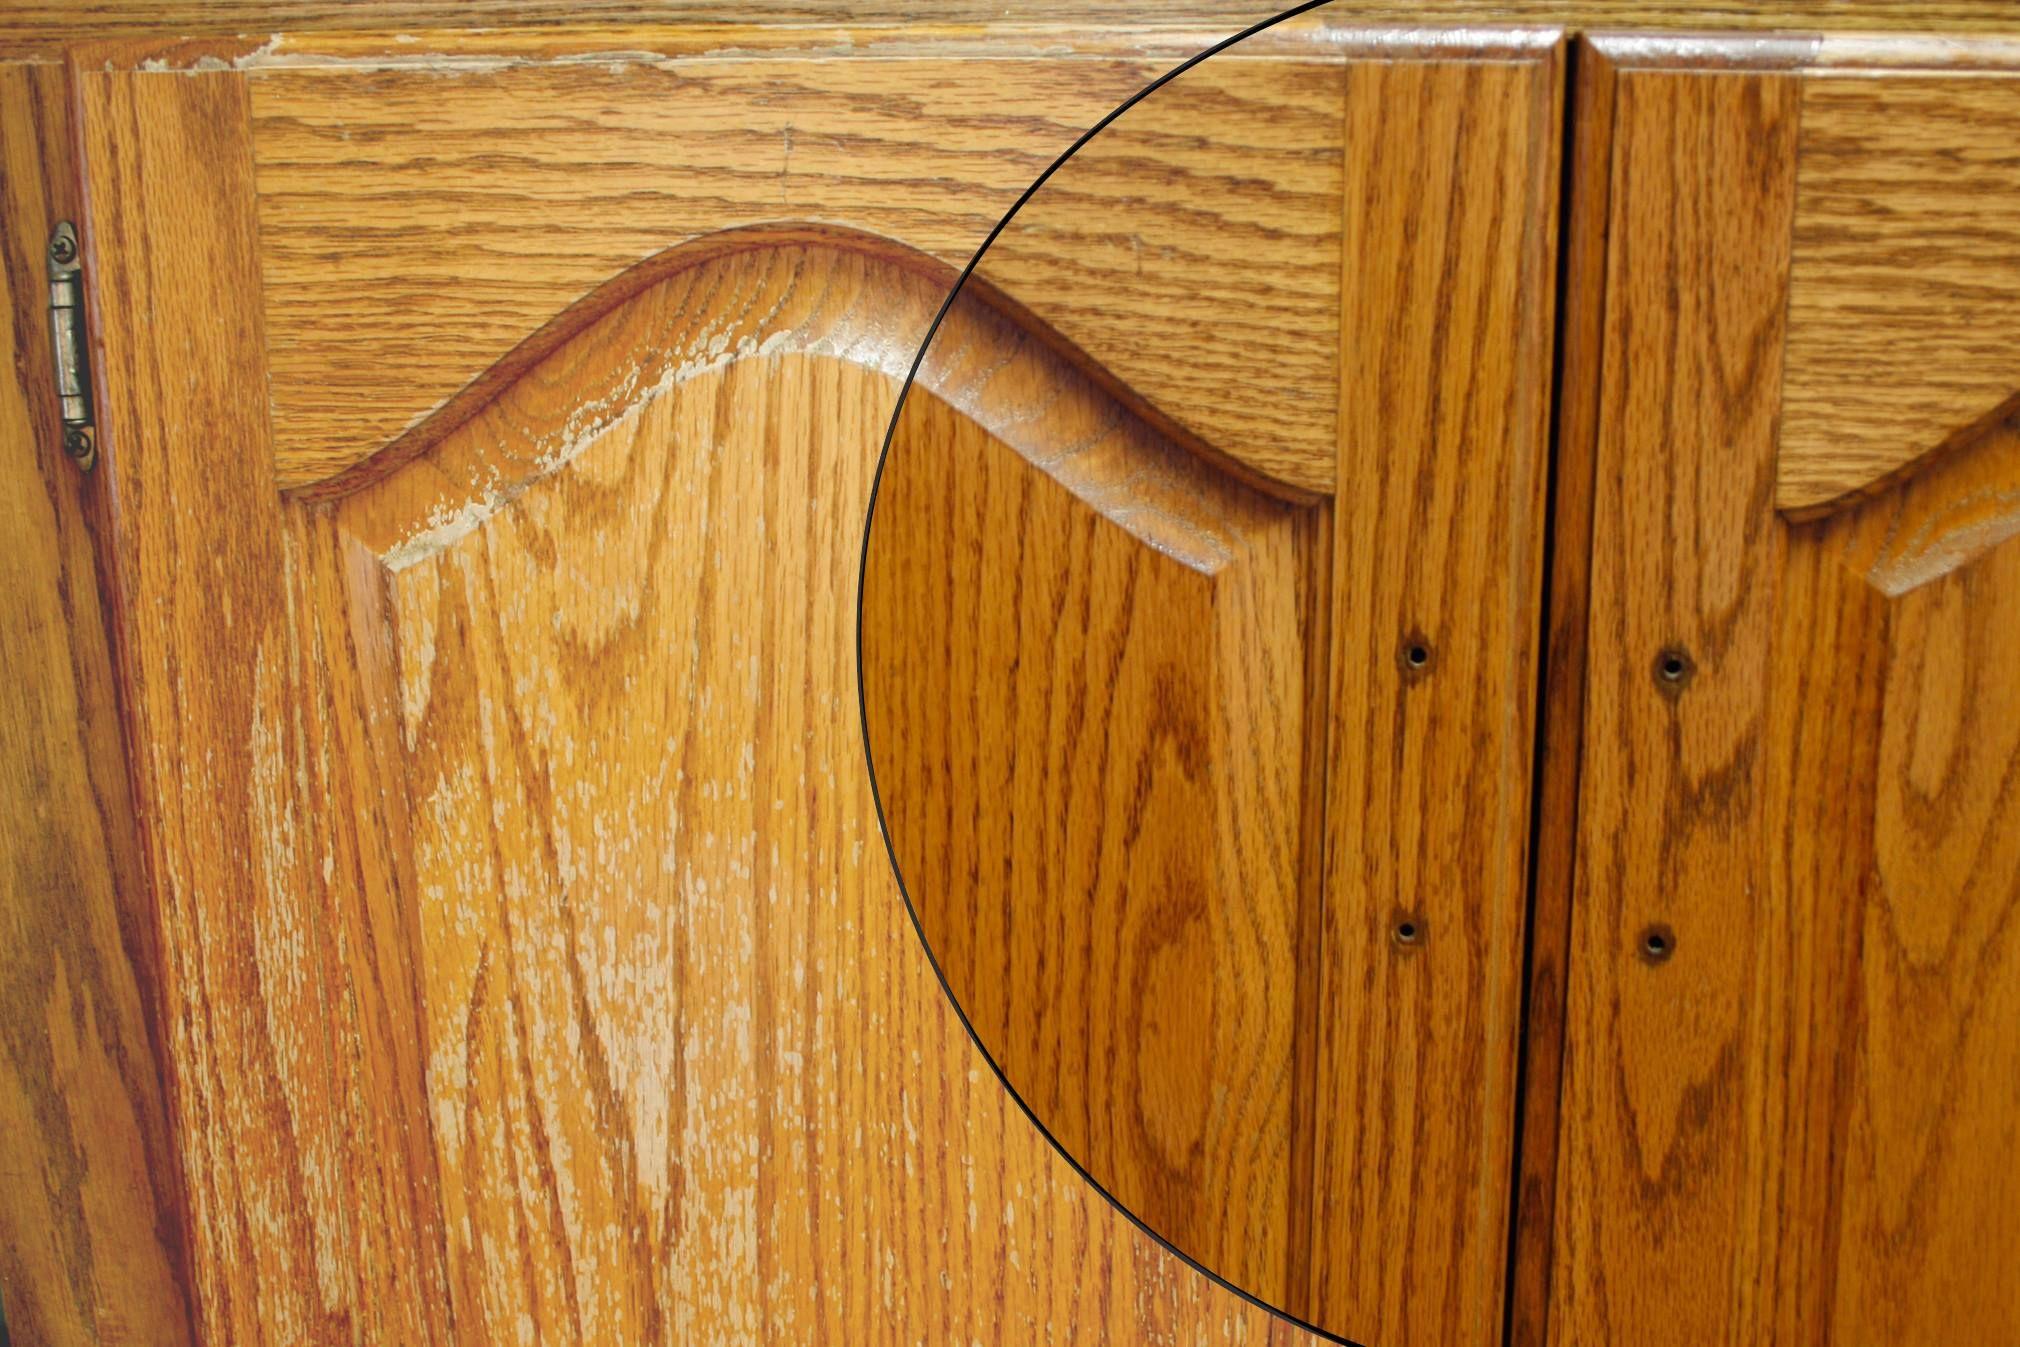 Restoring Water Damaged Oak Cabinets Nhance Can Bring Your Old Kitchen Back To Life Oak Cabinets Refinishing Cabinets Wood Refinishing